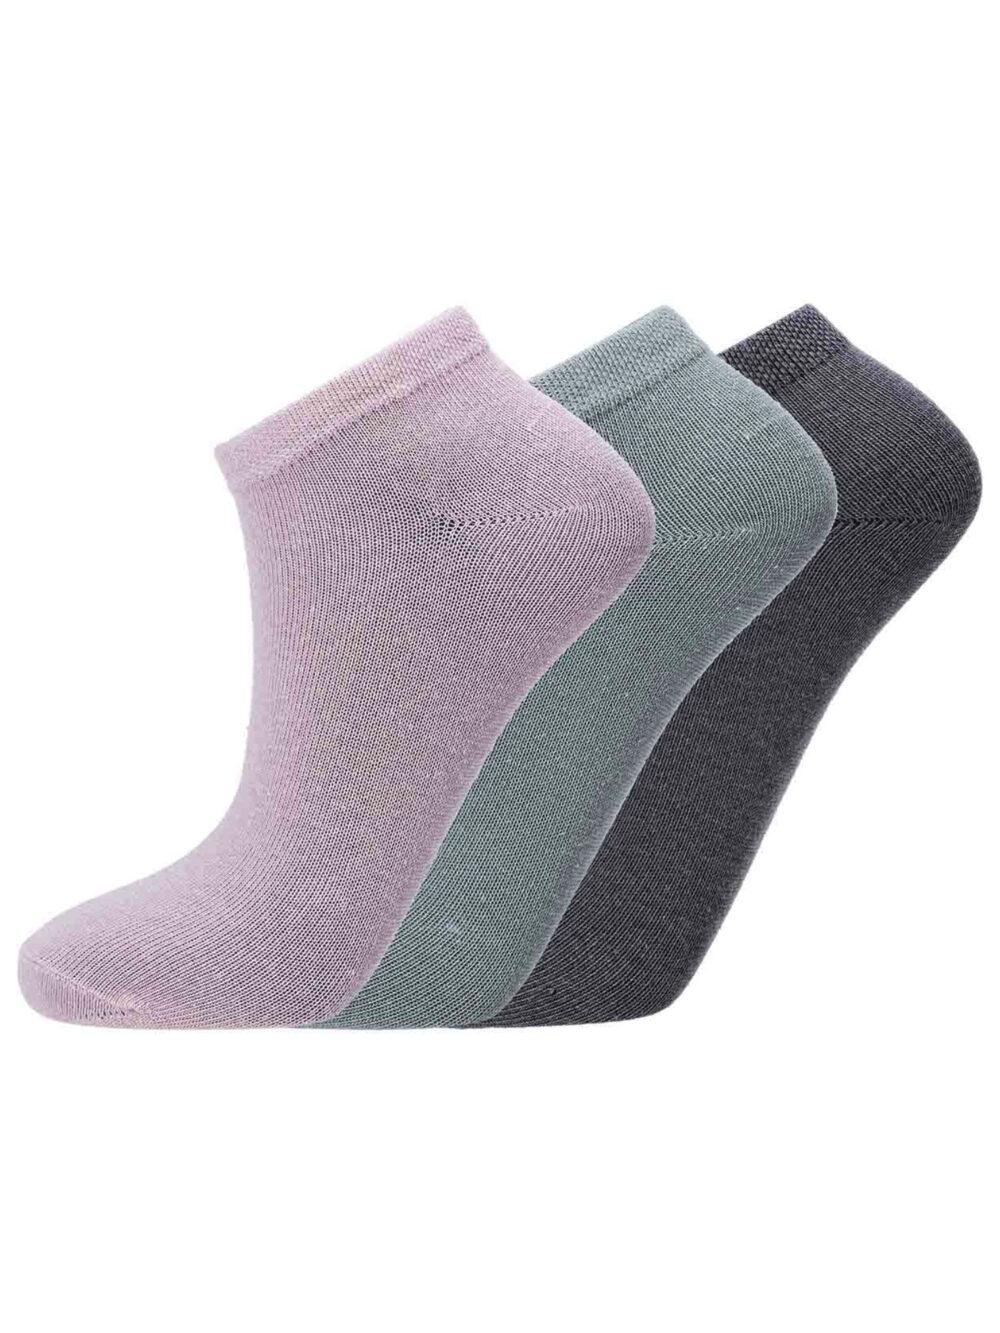 Athlecia Bonie Low Cut Sock 3-pack Chic Gray